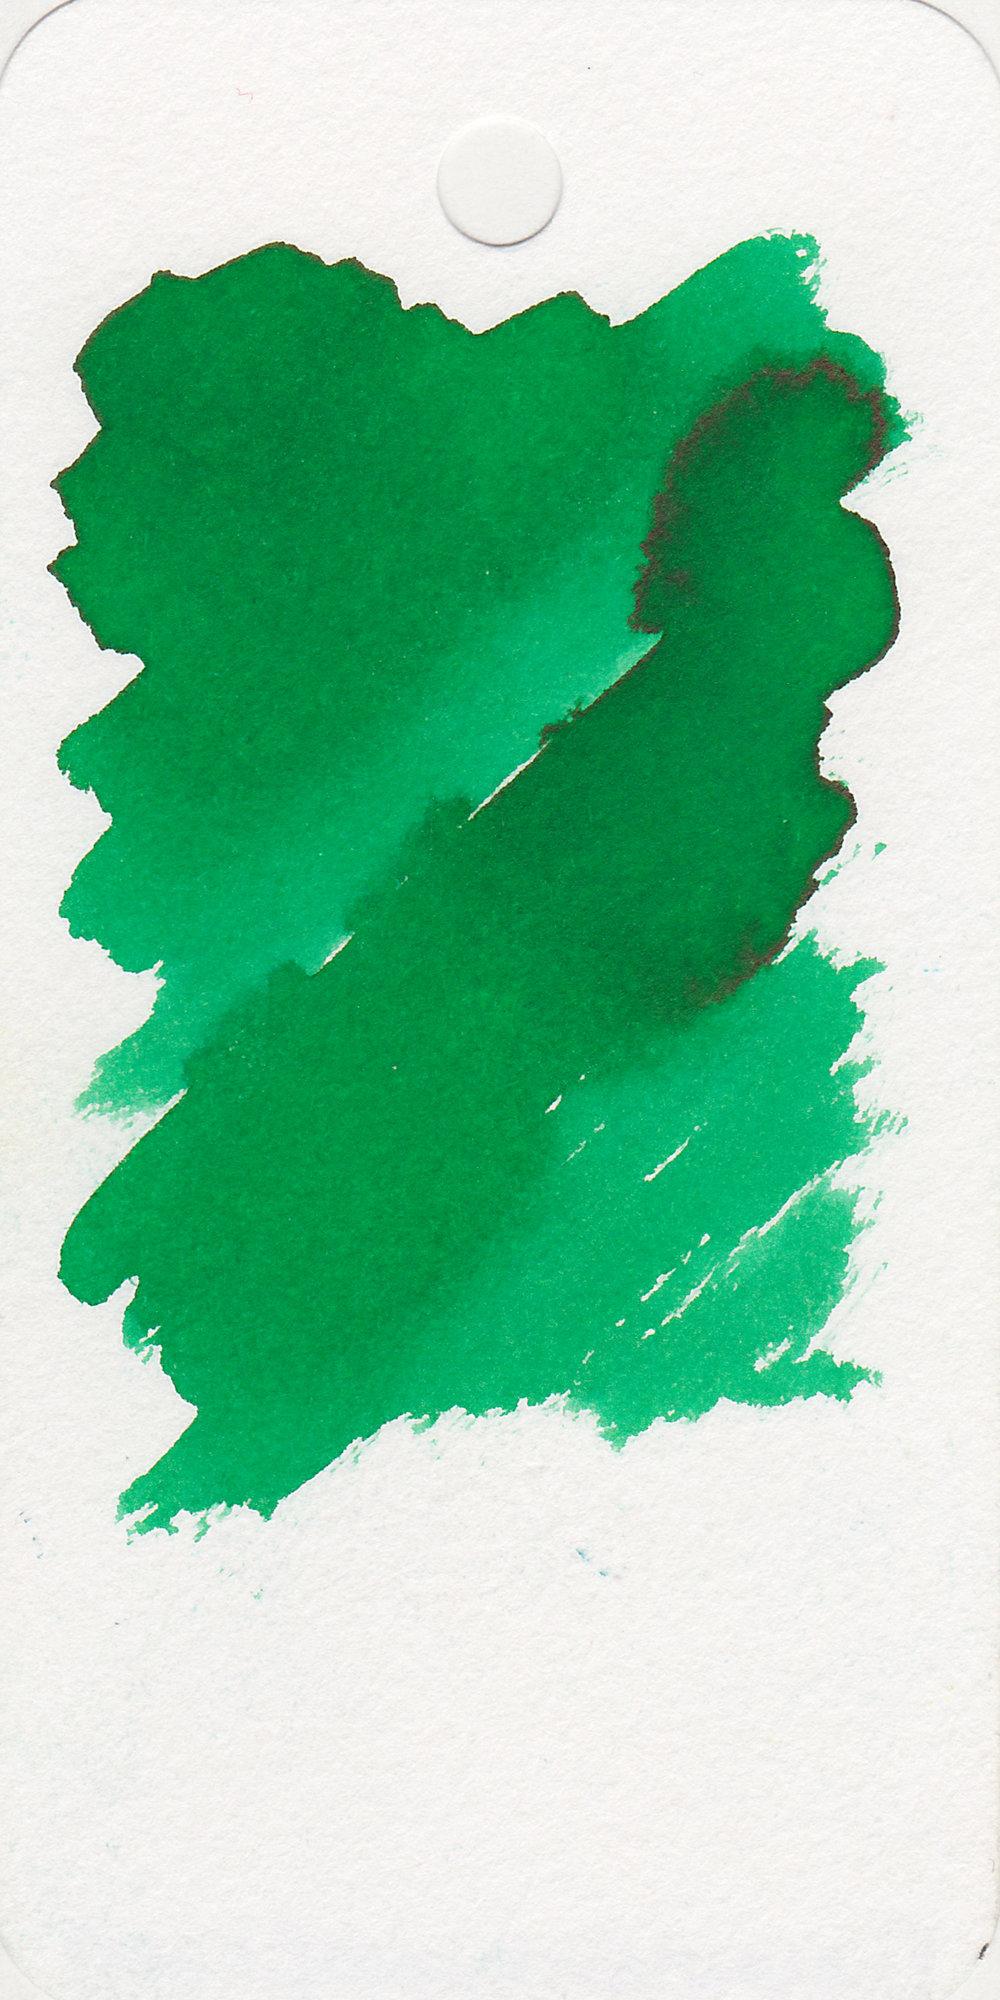 skr-emerald-green-4.jpg